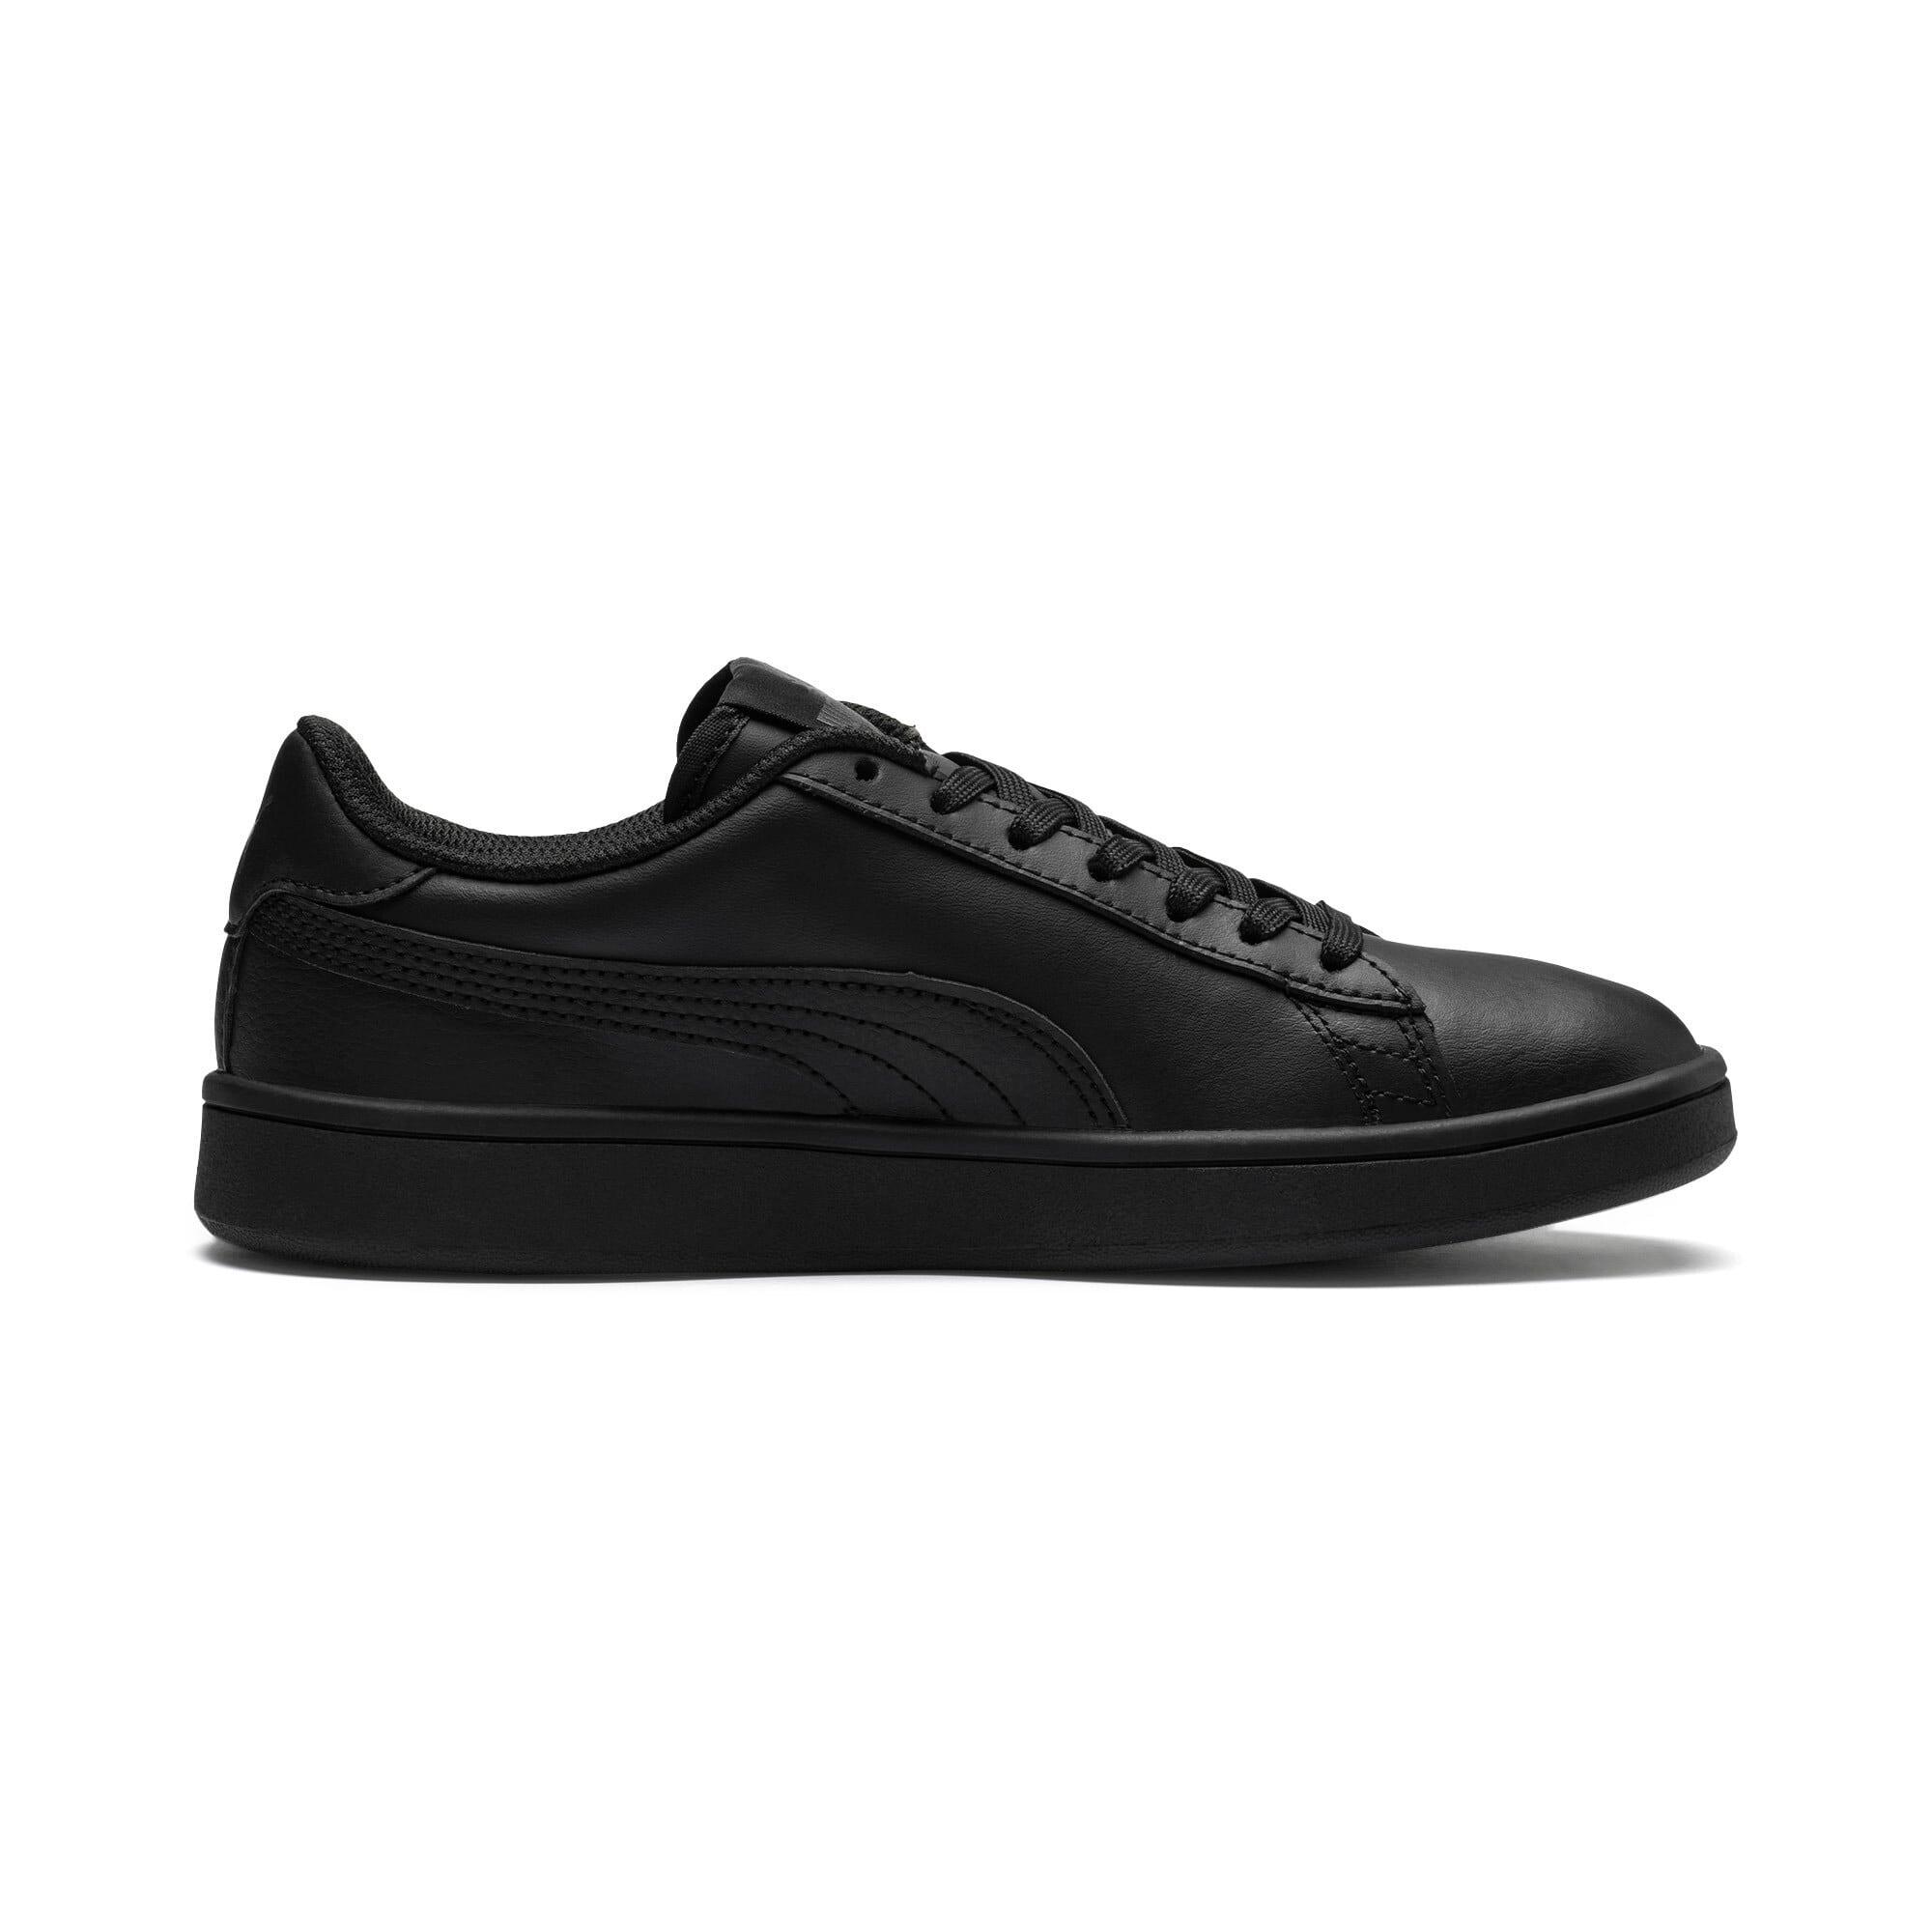 Thumbnail 5 of PUMA Smash v2 Leather Sneakers JR, Puma Black-Puma Black, medium